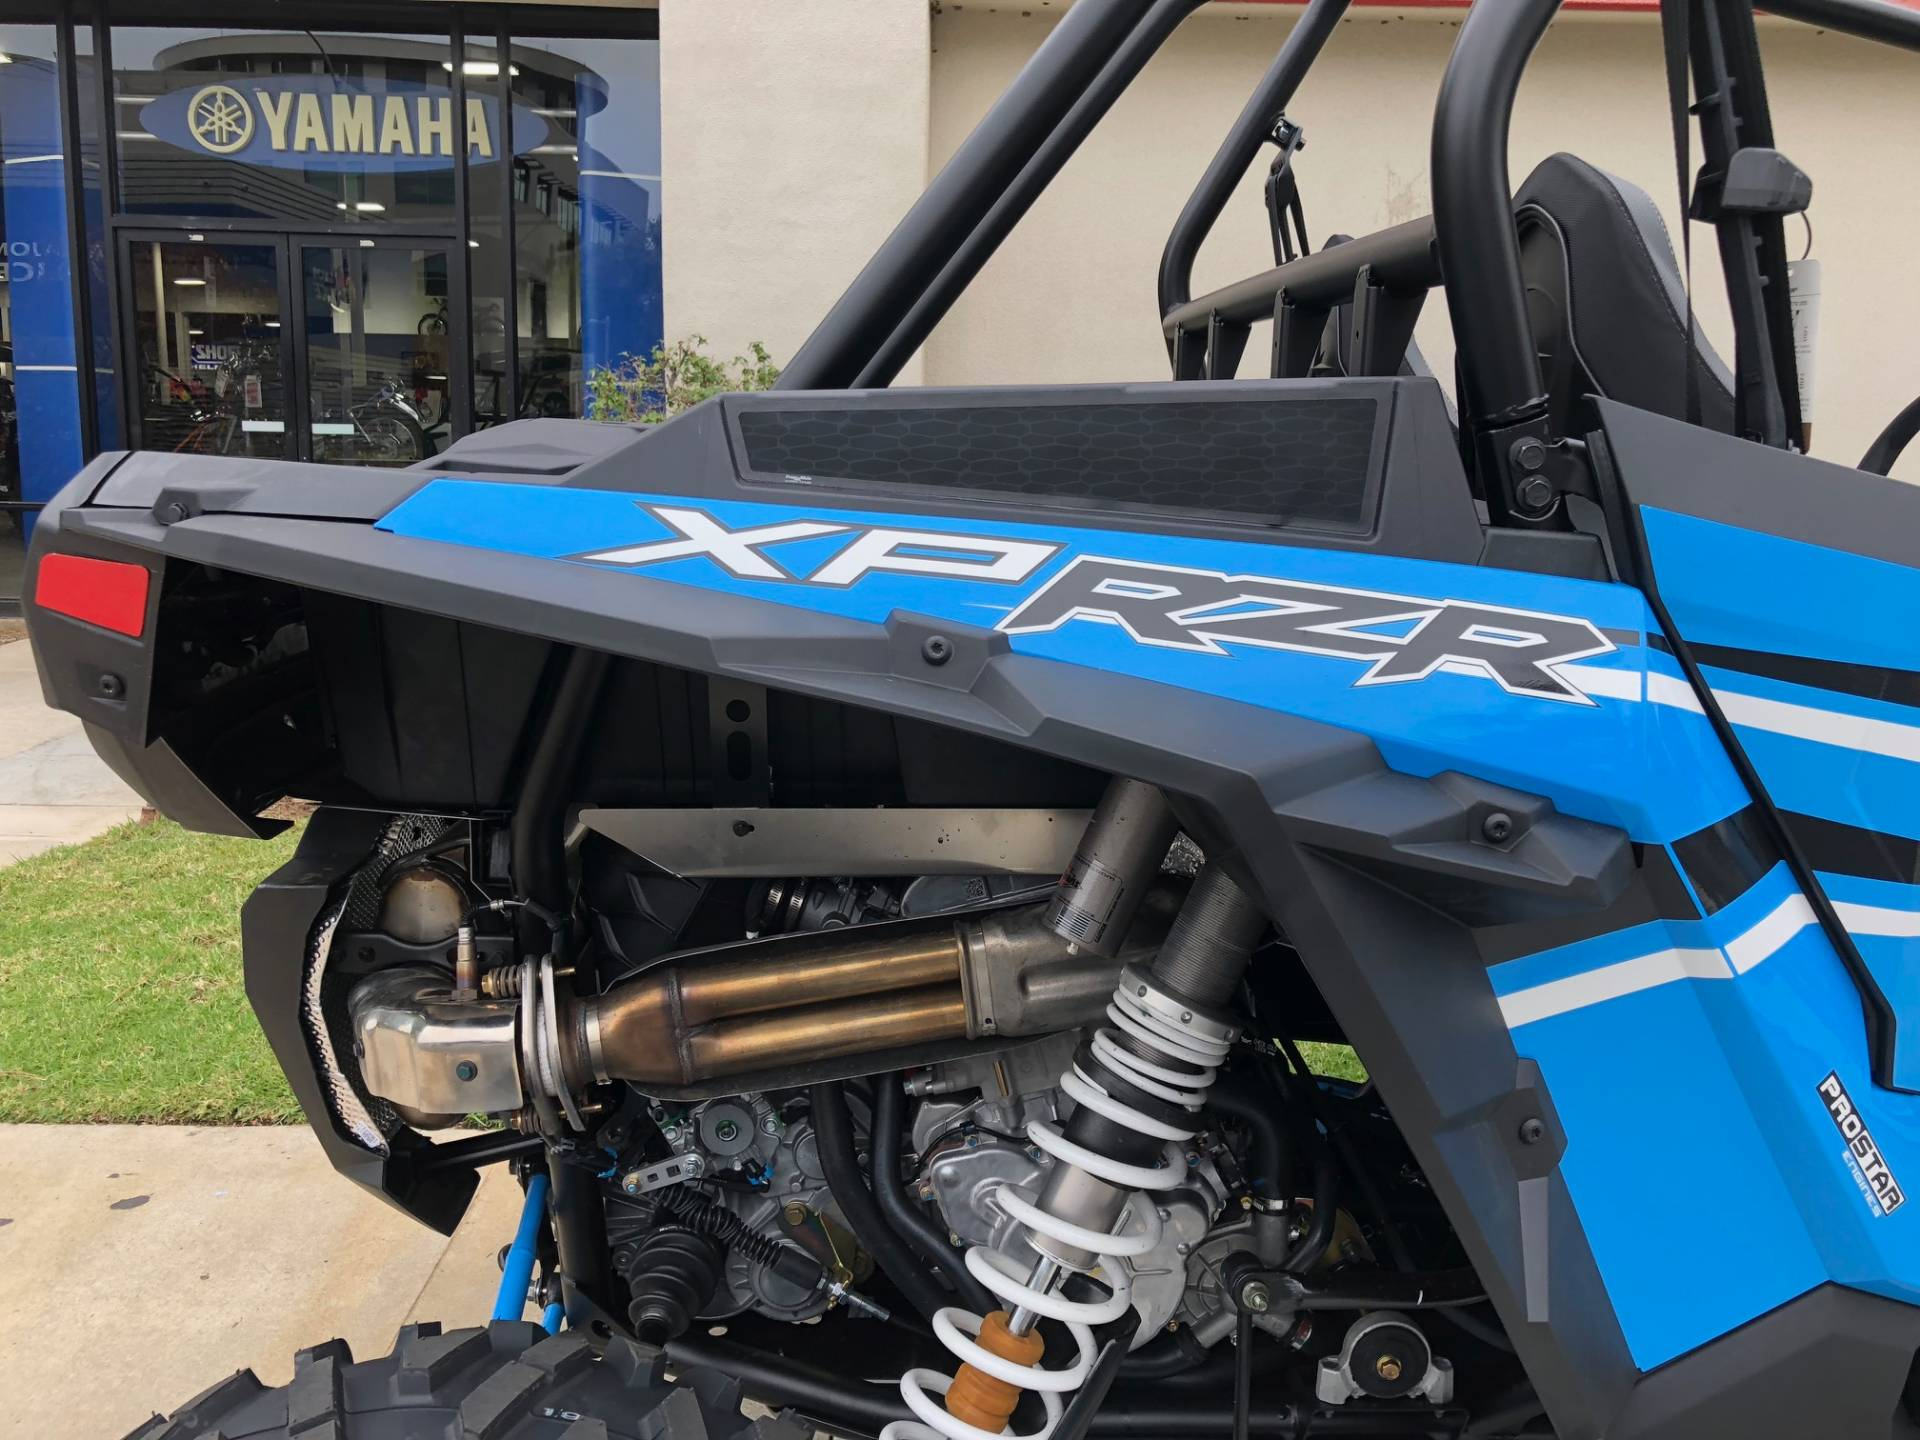 МОТОВЕЗДЕХОД POLARIS RZR XP 1000 EPS Sky Blue ― Артмото - купить квадроцикл в украине и харькове, мотоцикл, снегоход, скутер, мопед, электромобиль